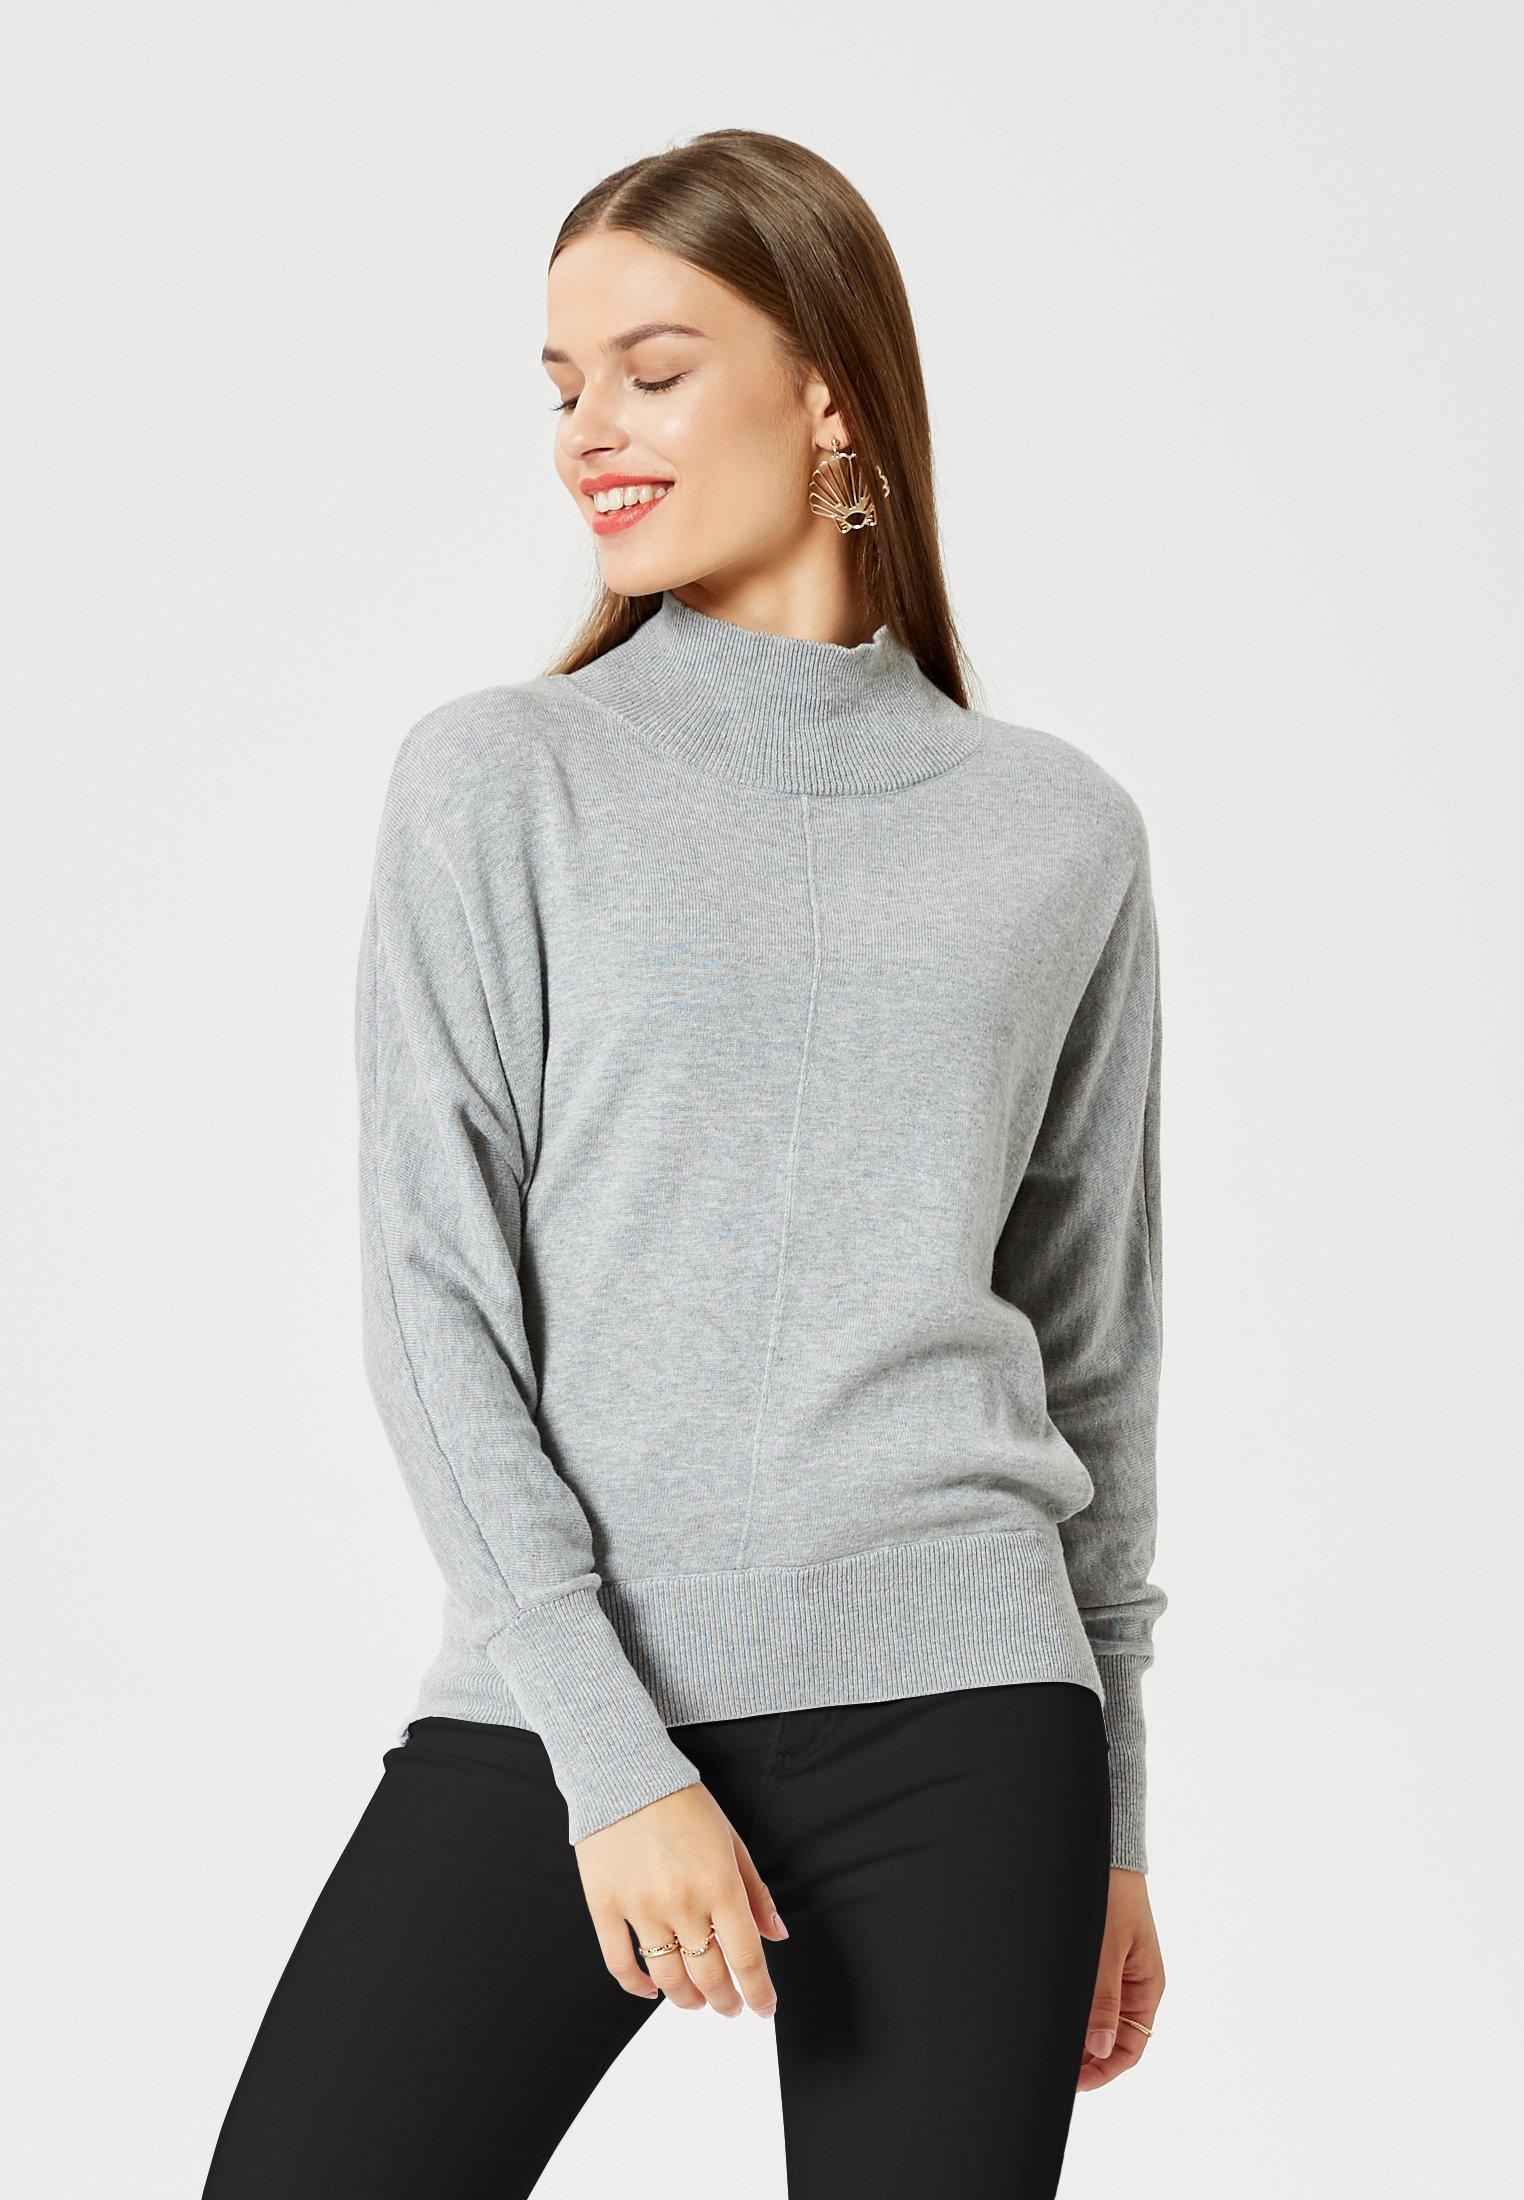 Felipa Pullover - gris clair - Pulls & Gilets Femme tu0cU